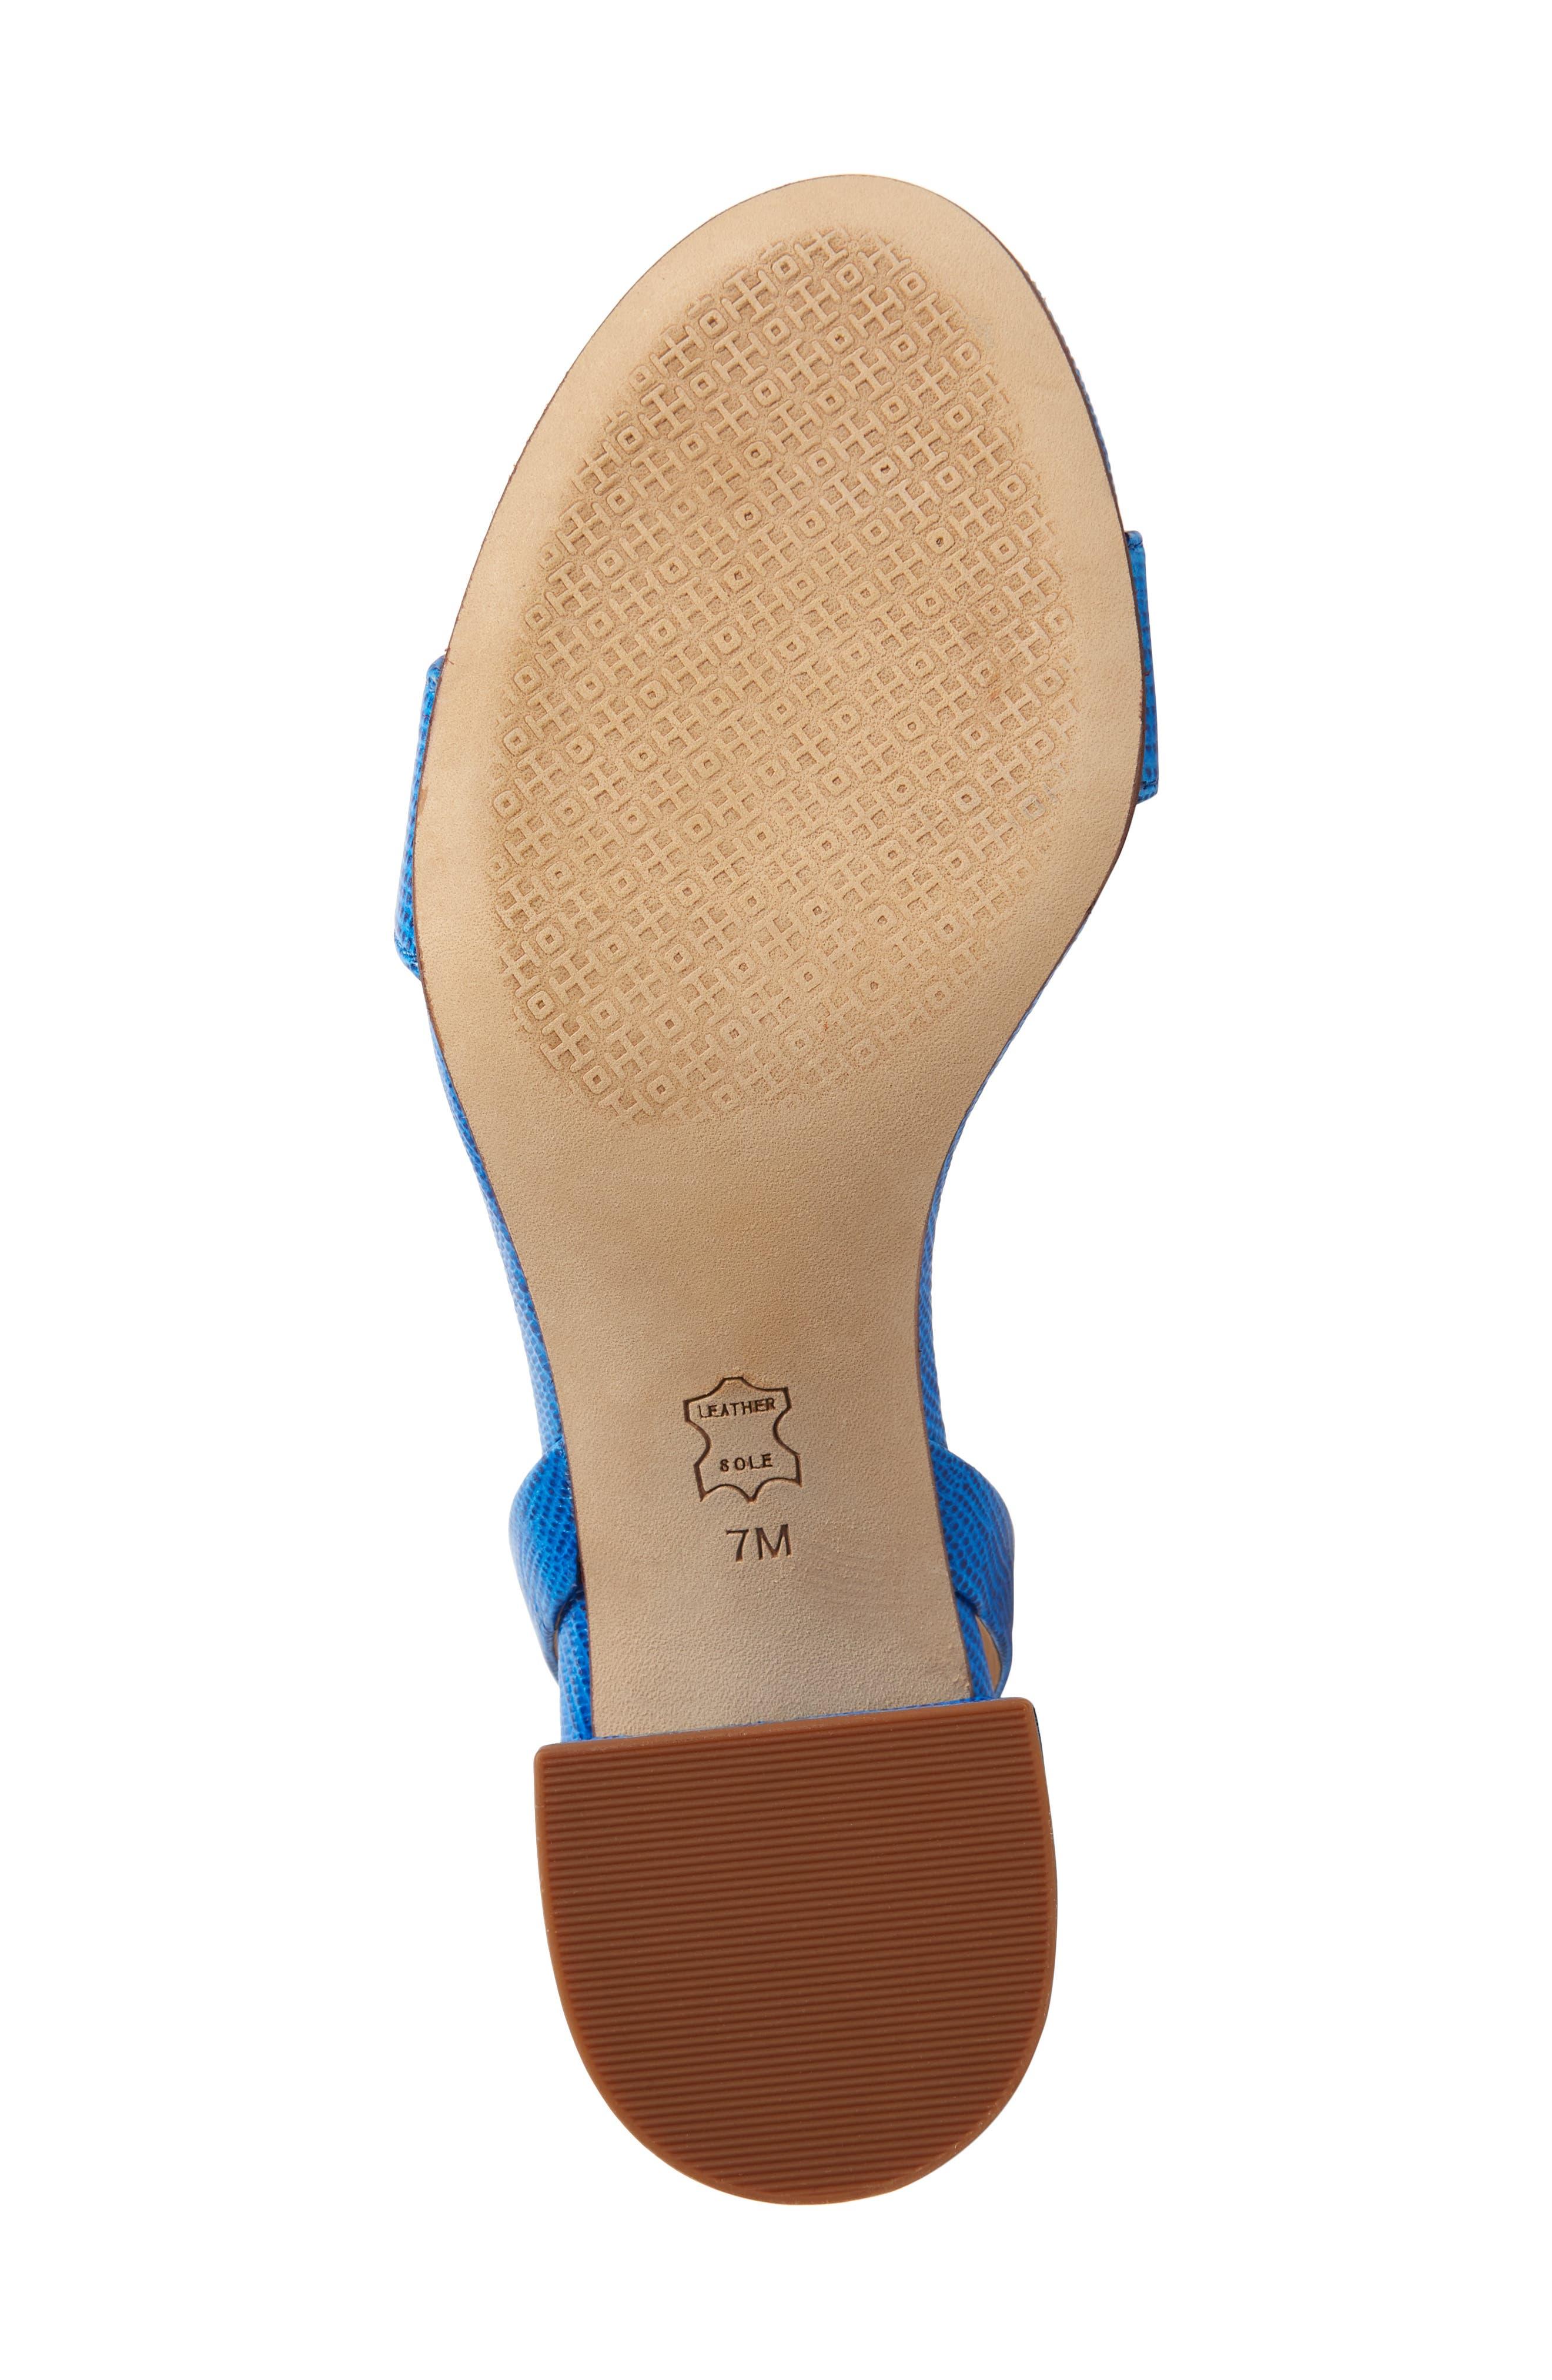 TORY BURCH, Kira Block Heel Sandal, Alternate thumbnail 6, color, BRIGHT TROPICAL BLUE